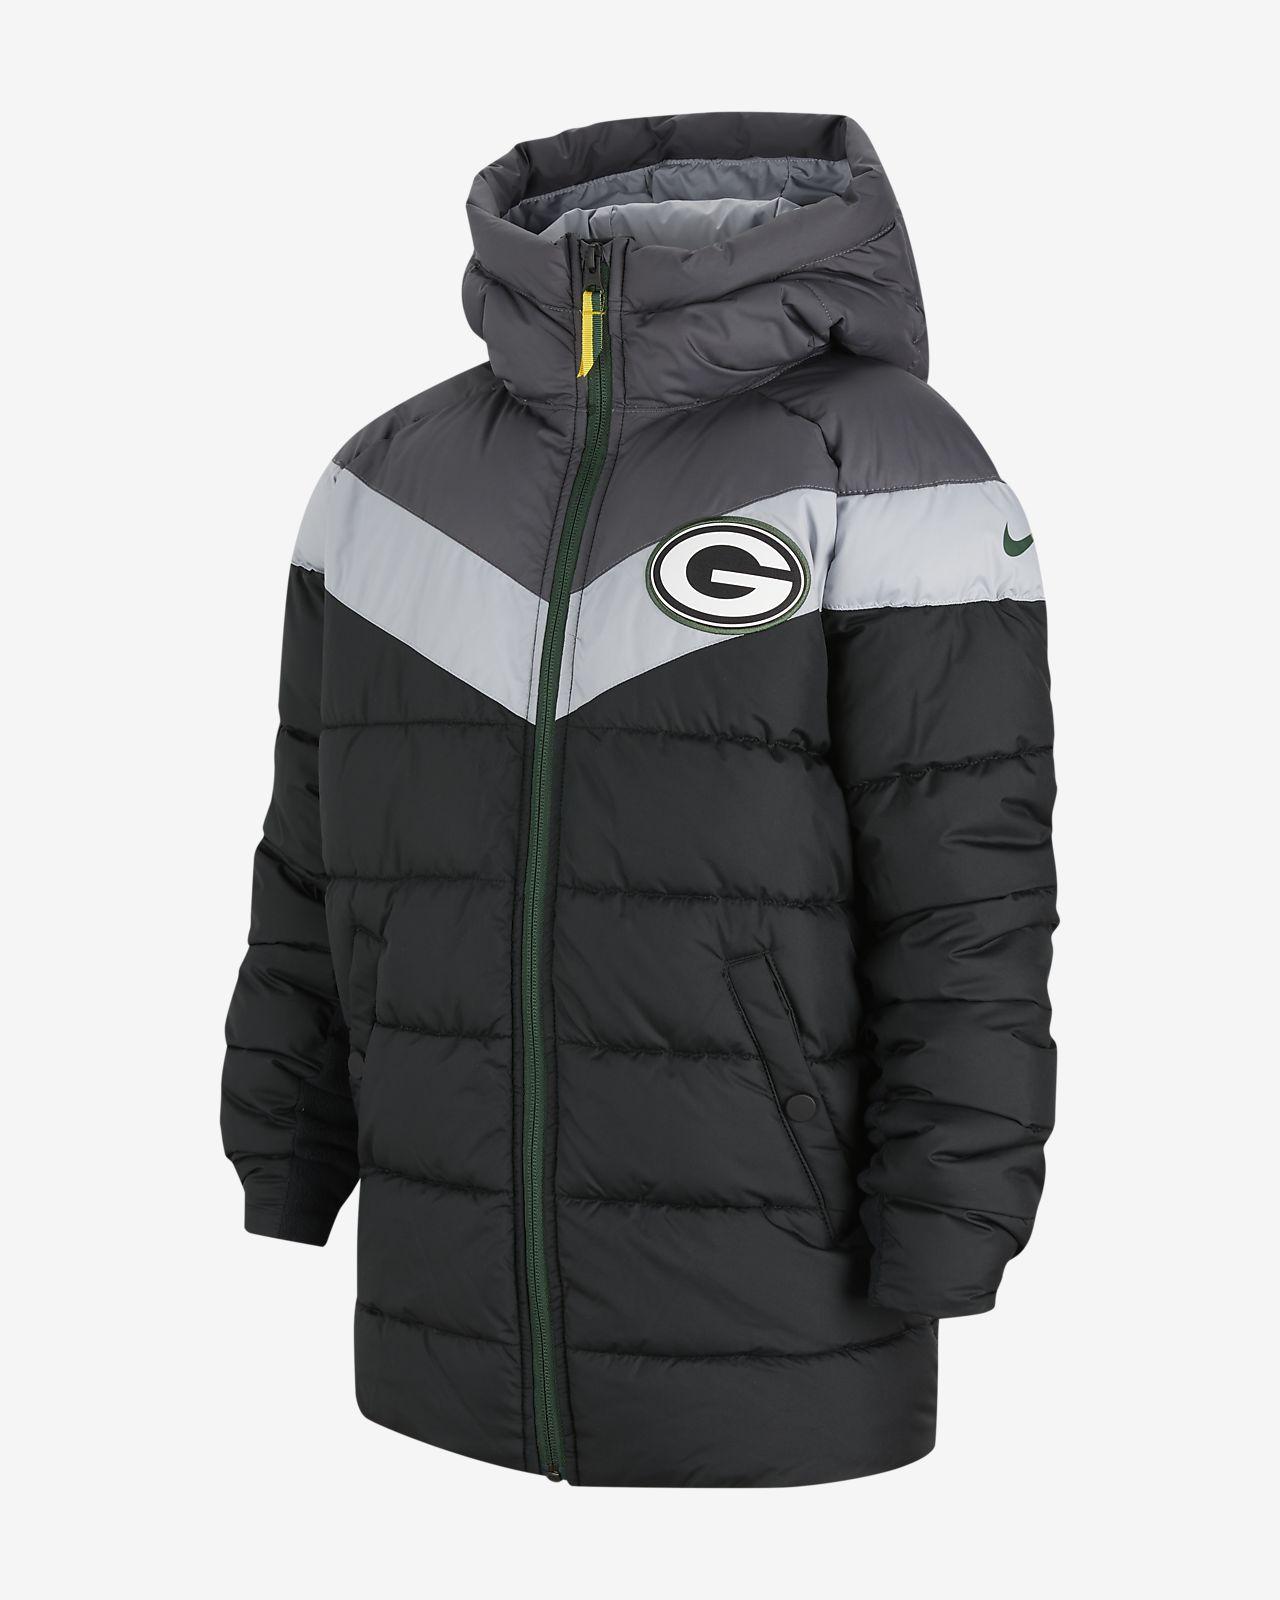 Nike Nfl Seahawks Big Kids Hooded Puffer Jacket Nike Com Nike Nfl Nfl Seahawks Puffer Jackets [ 1600 x 1280 Pixel ]